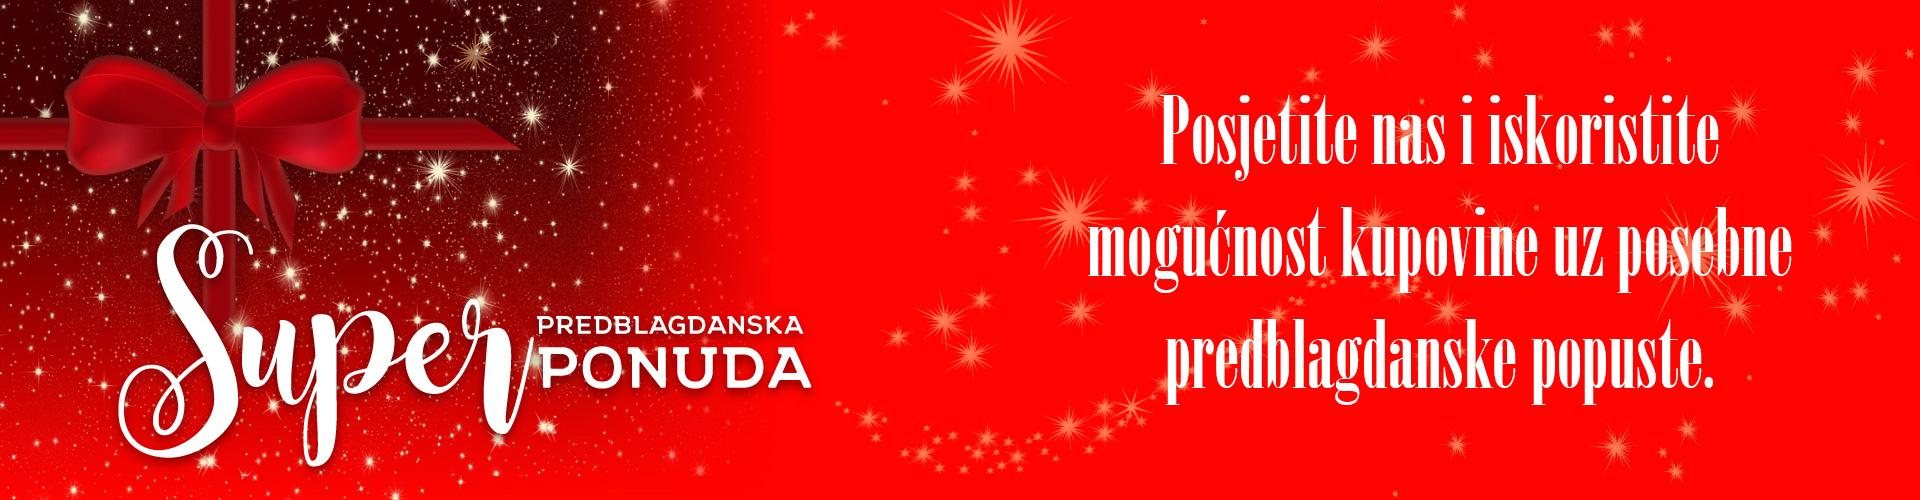 https://www.kimicommerce.hr/Repository/Banners/largeBanners-super-predblagdanska-ponuda-09122019.jpg